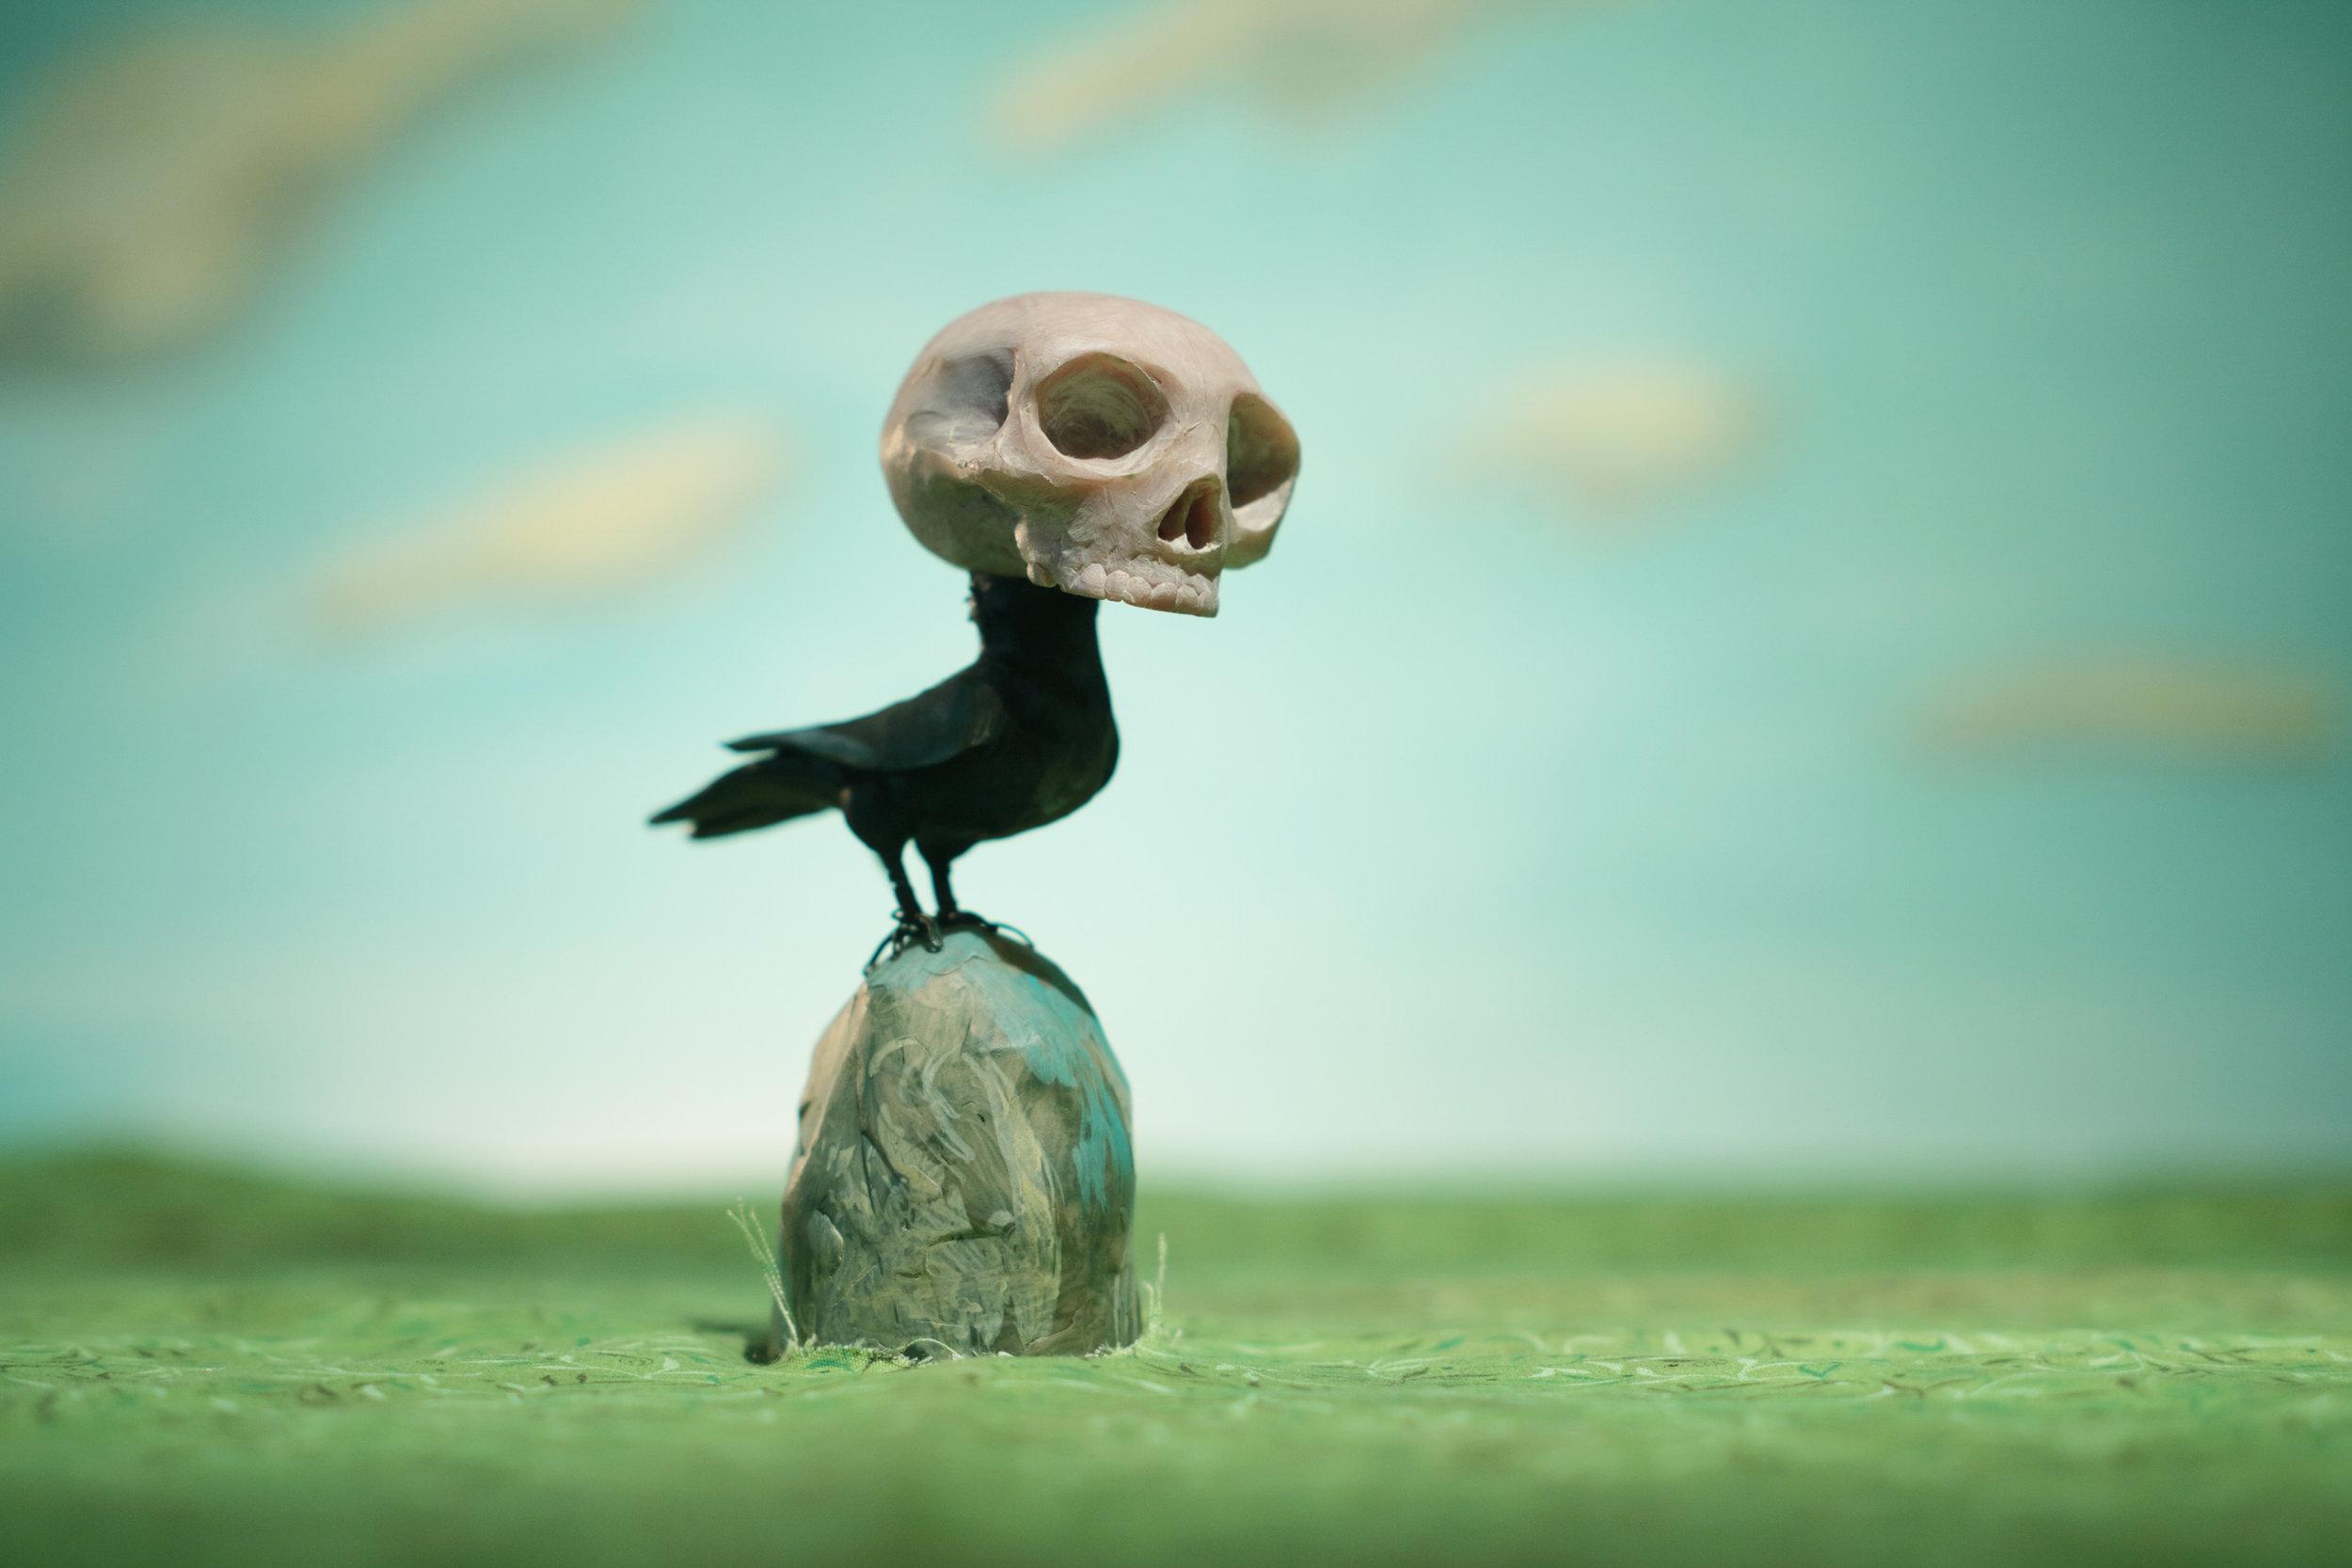 RedNose_BirdBrain_FINAL-lores.jpg